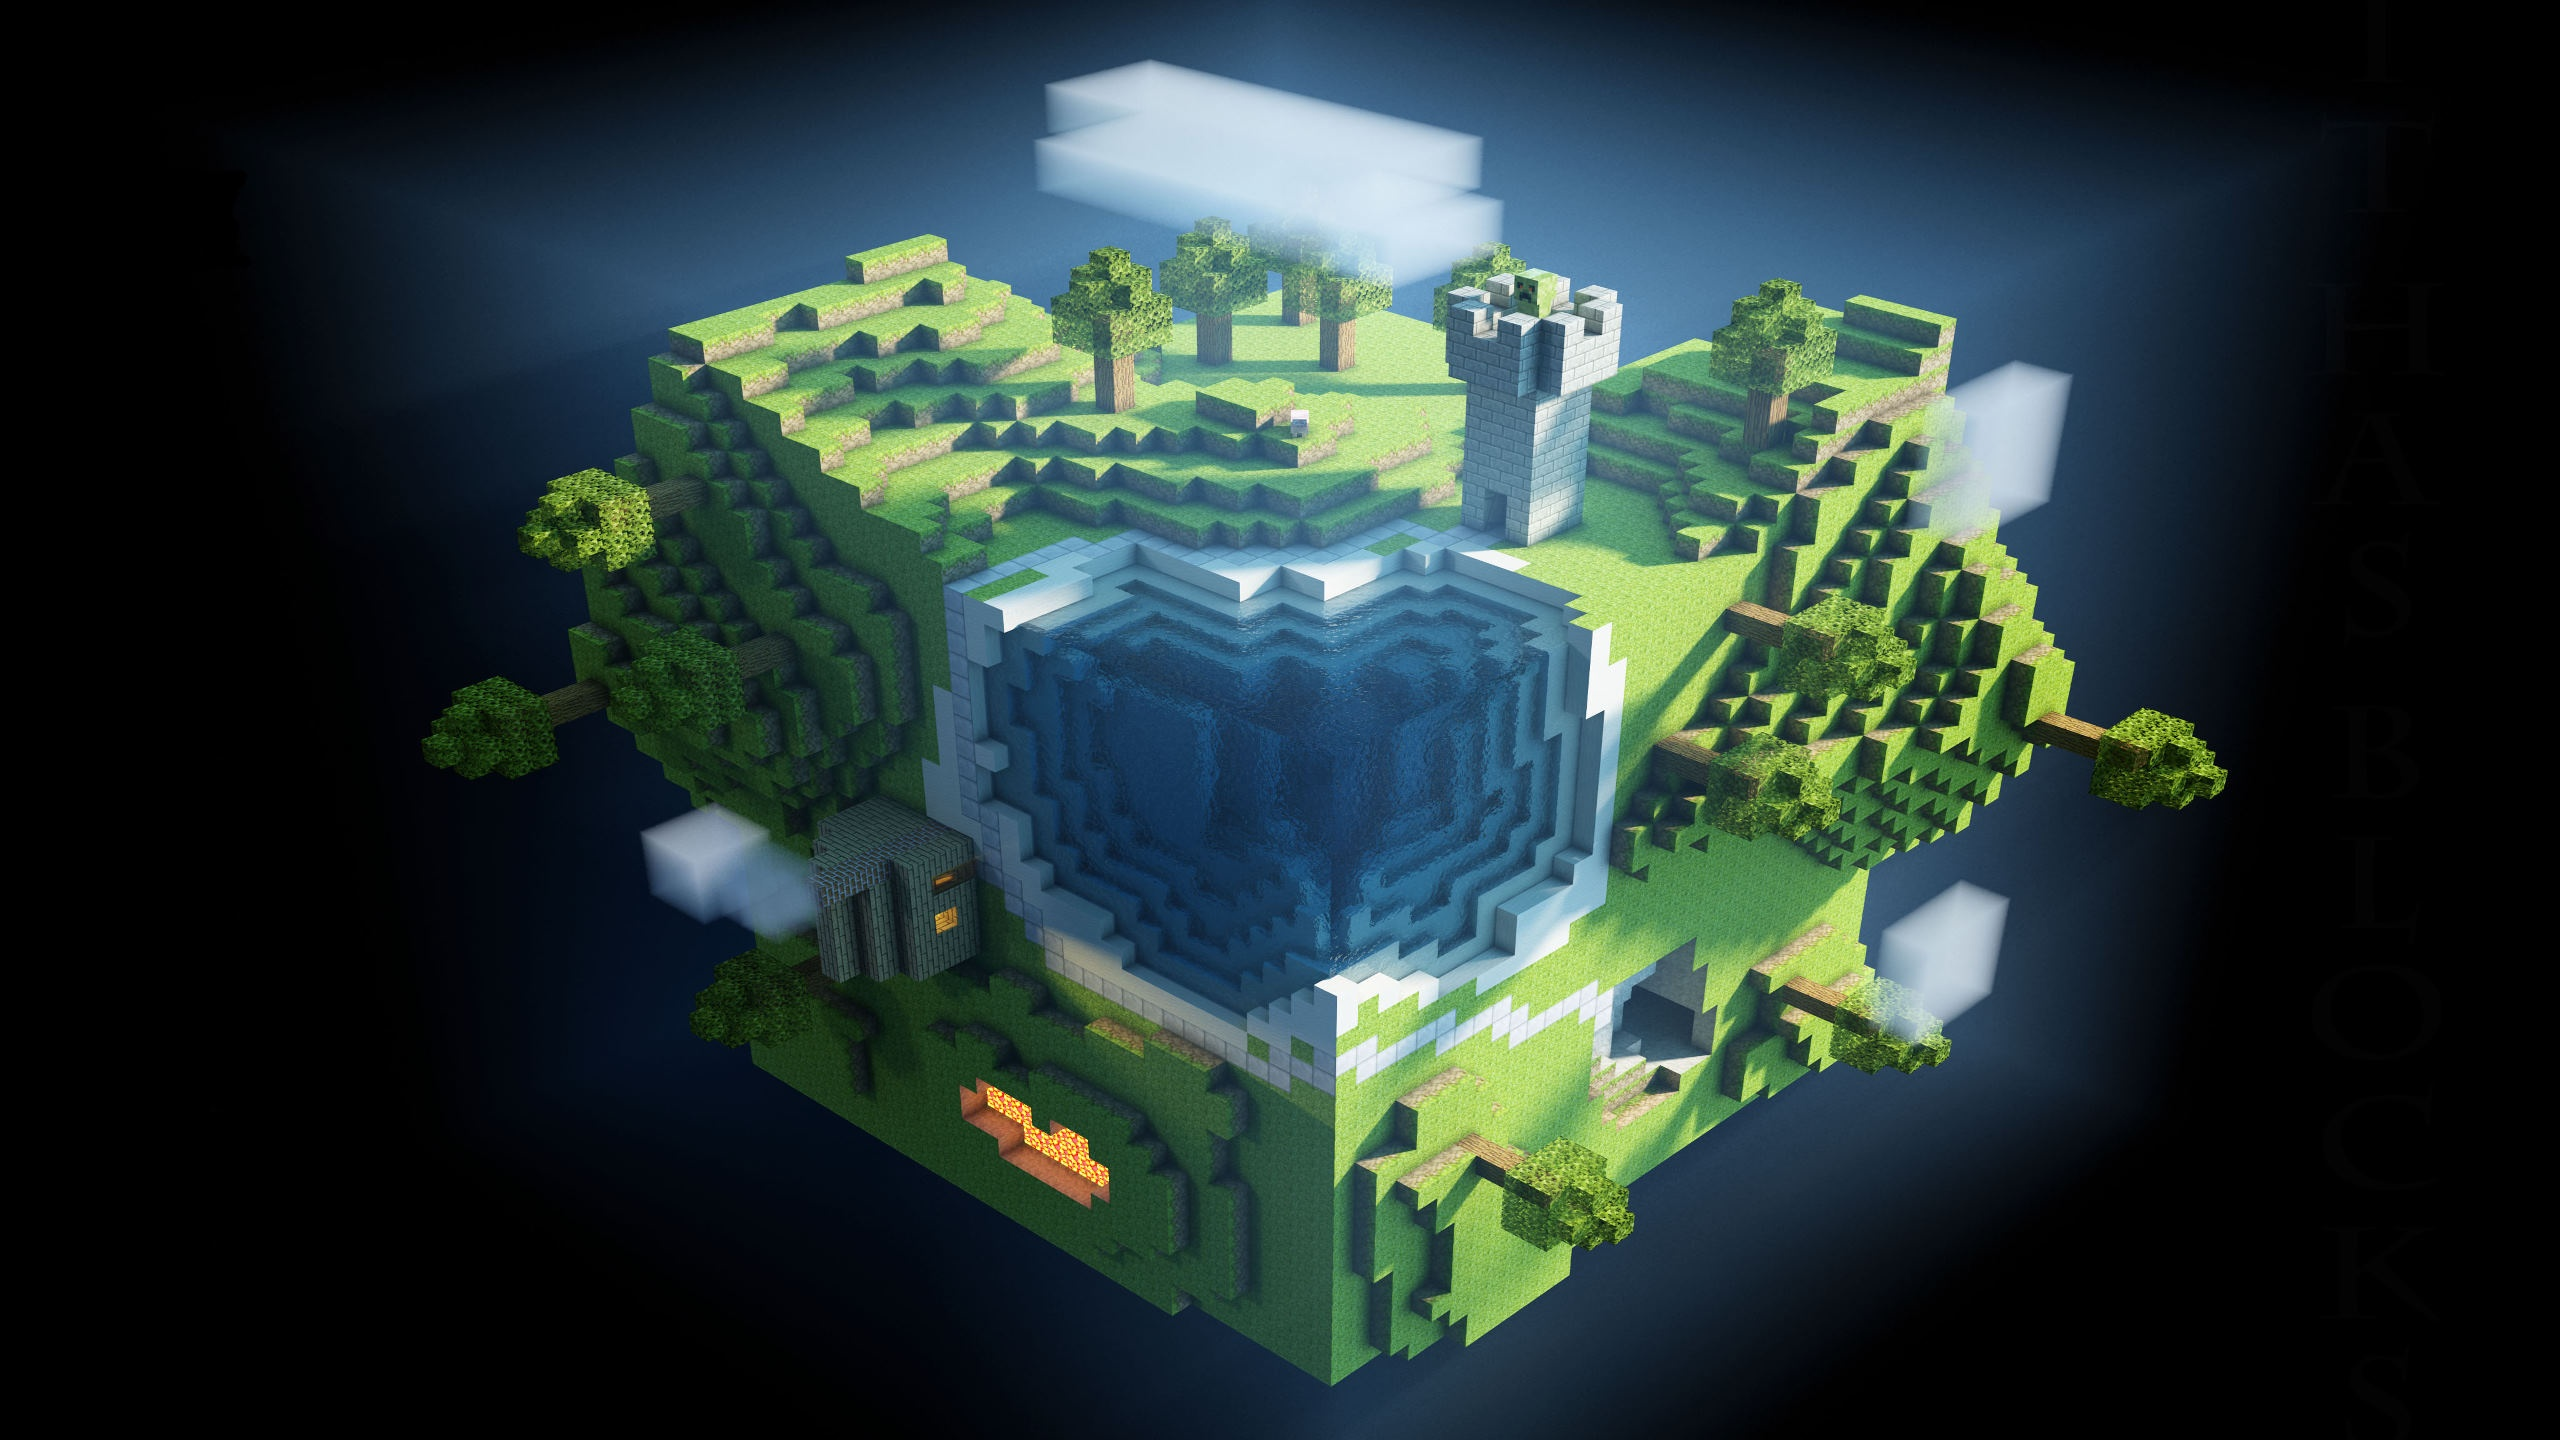 2560x1440 Minecraft desktop PC and Mac wallpaper 2560x1440